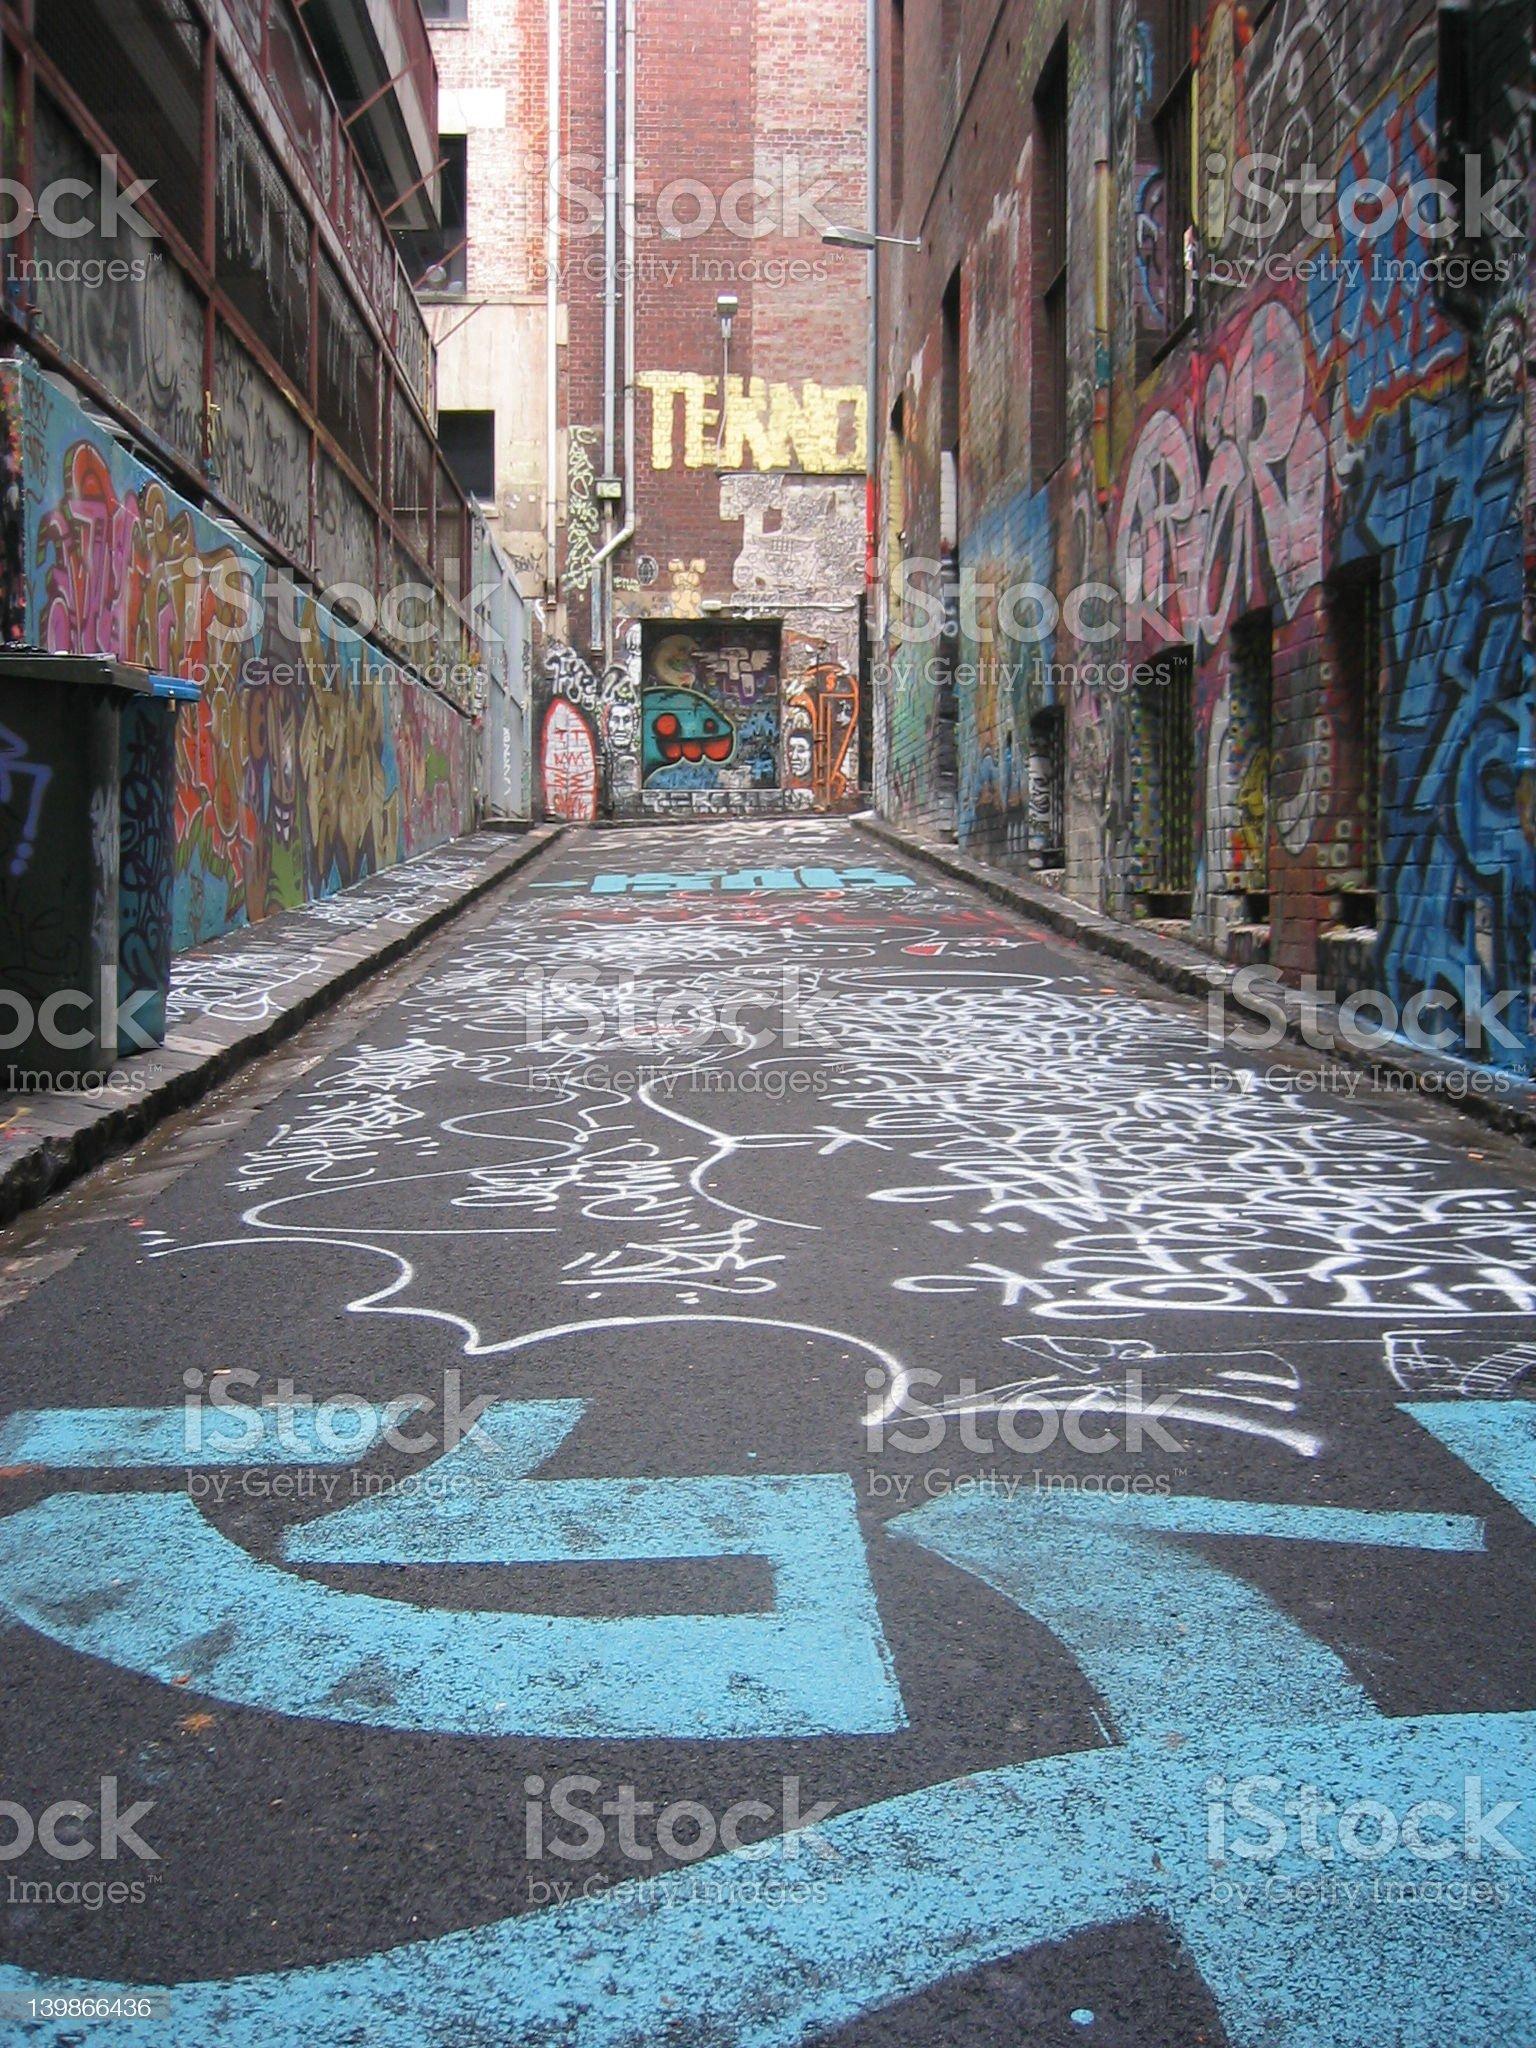 Graffiti everywhere royalty-free stock photo